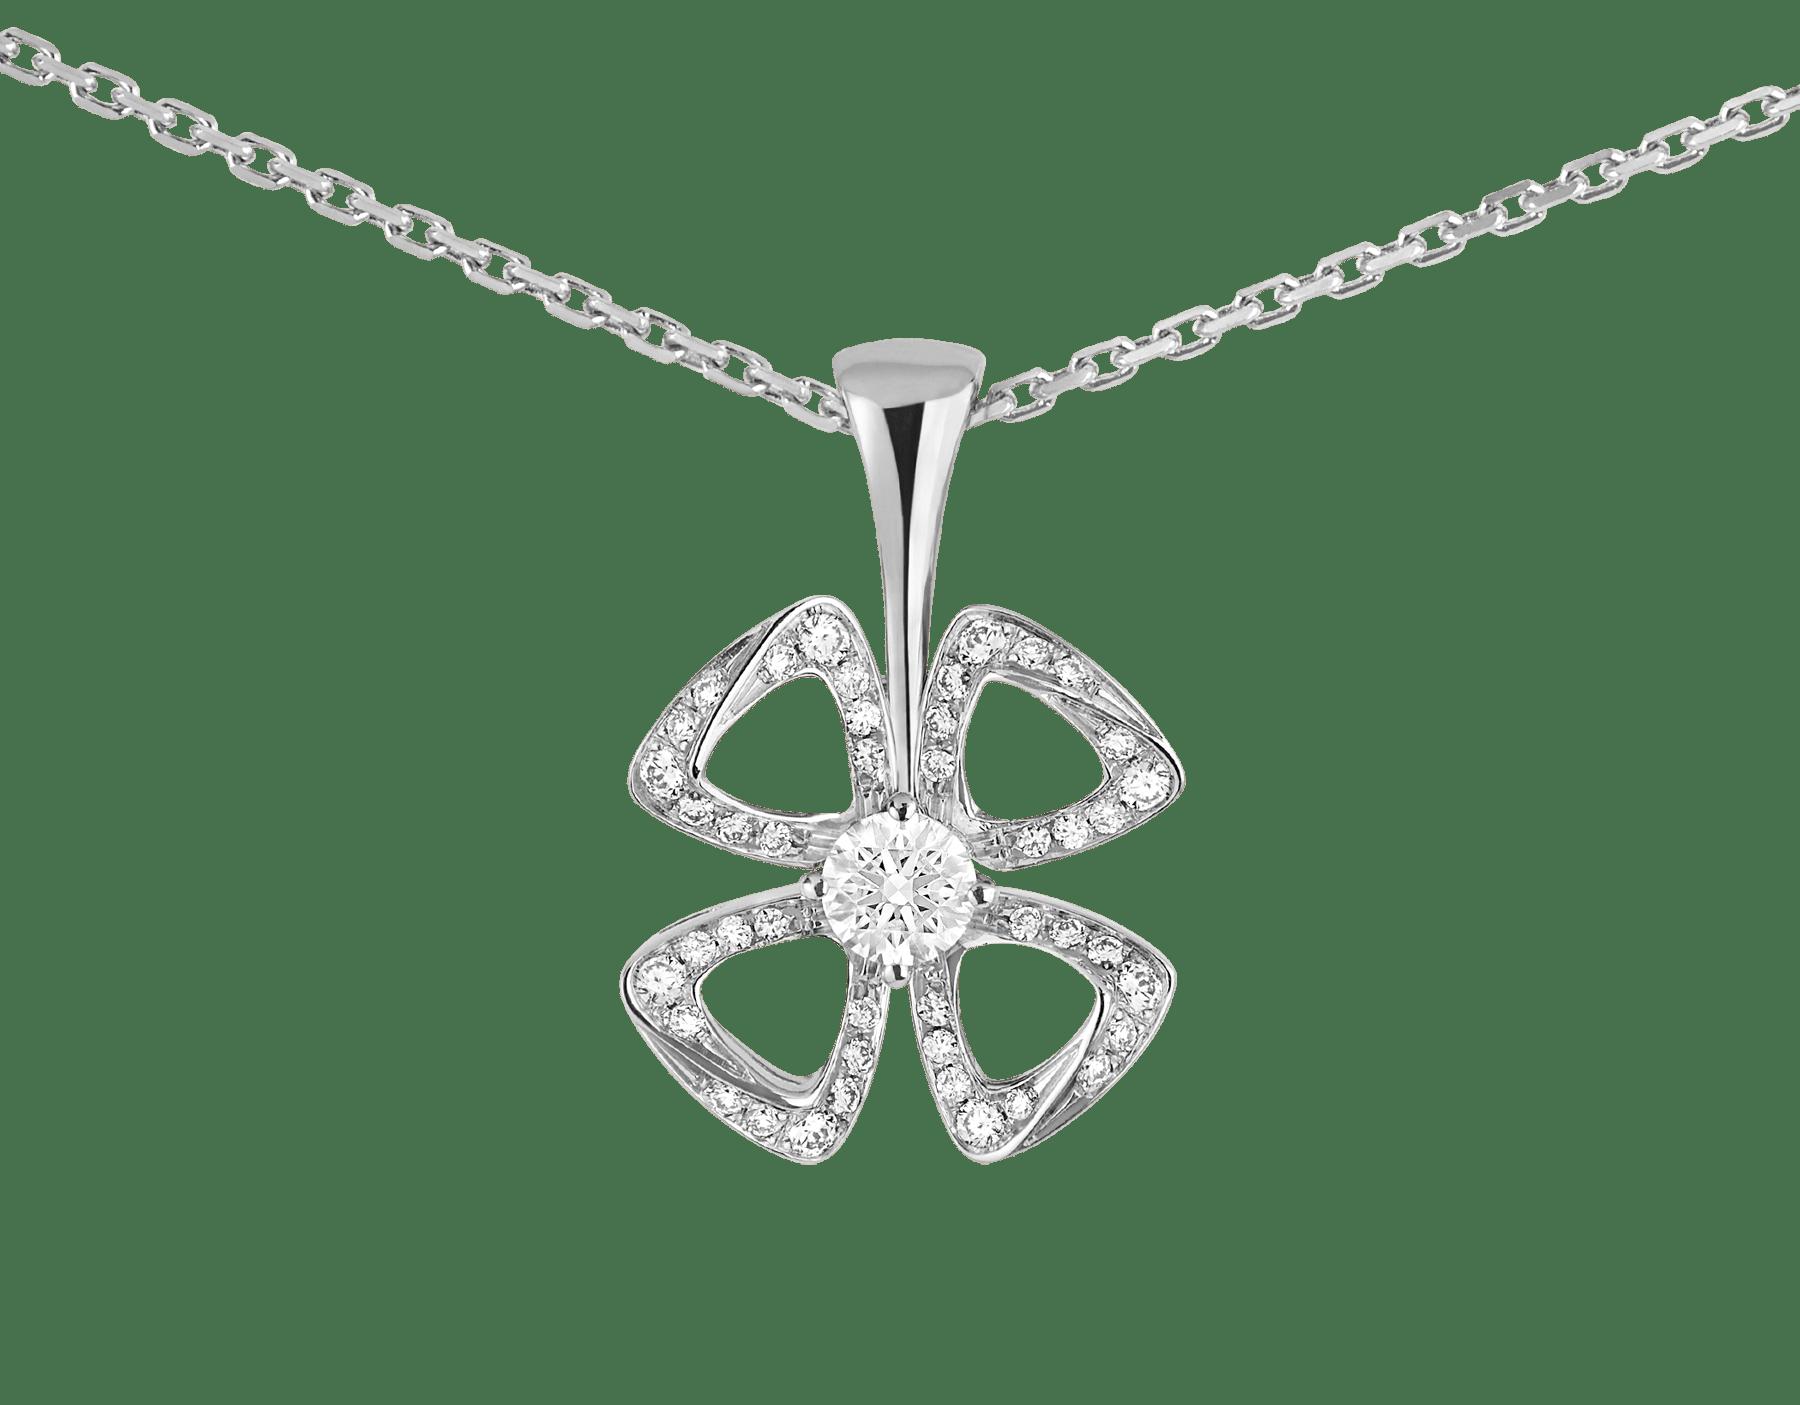 Fiorever 18K 白金項鍊,鑲飾 1 顆明亮型切割鑽石(0.10 克拉)和密鑲鑽石(0.06 克拉)。 358157 image 3